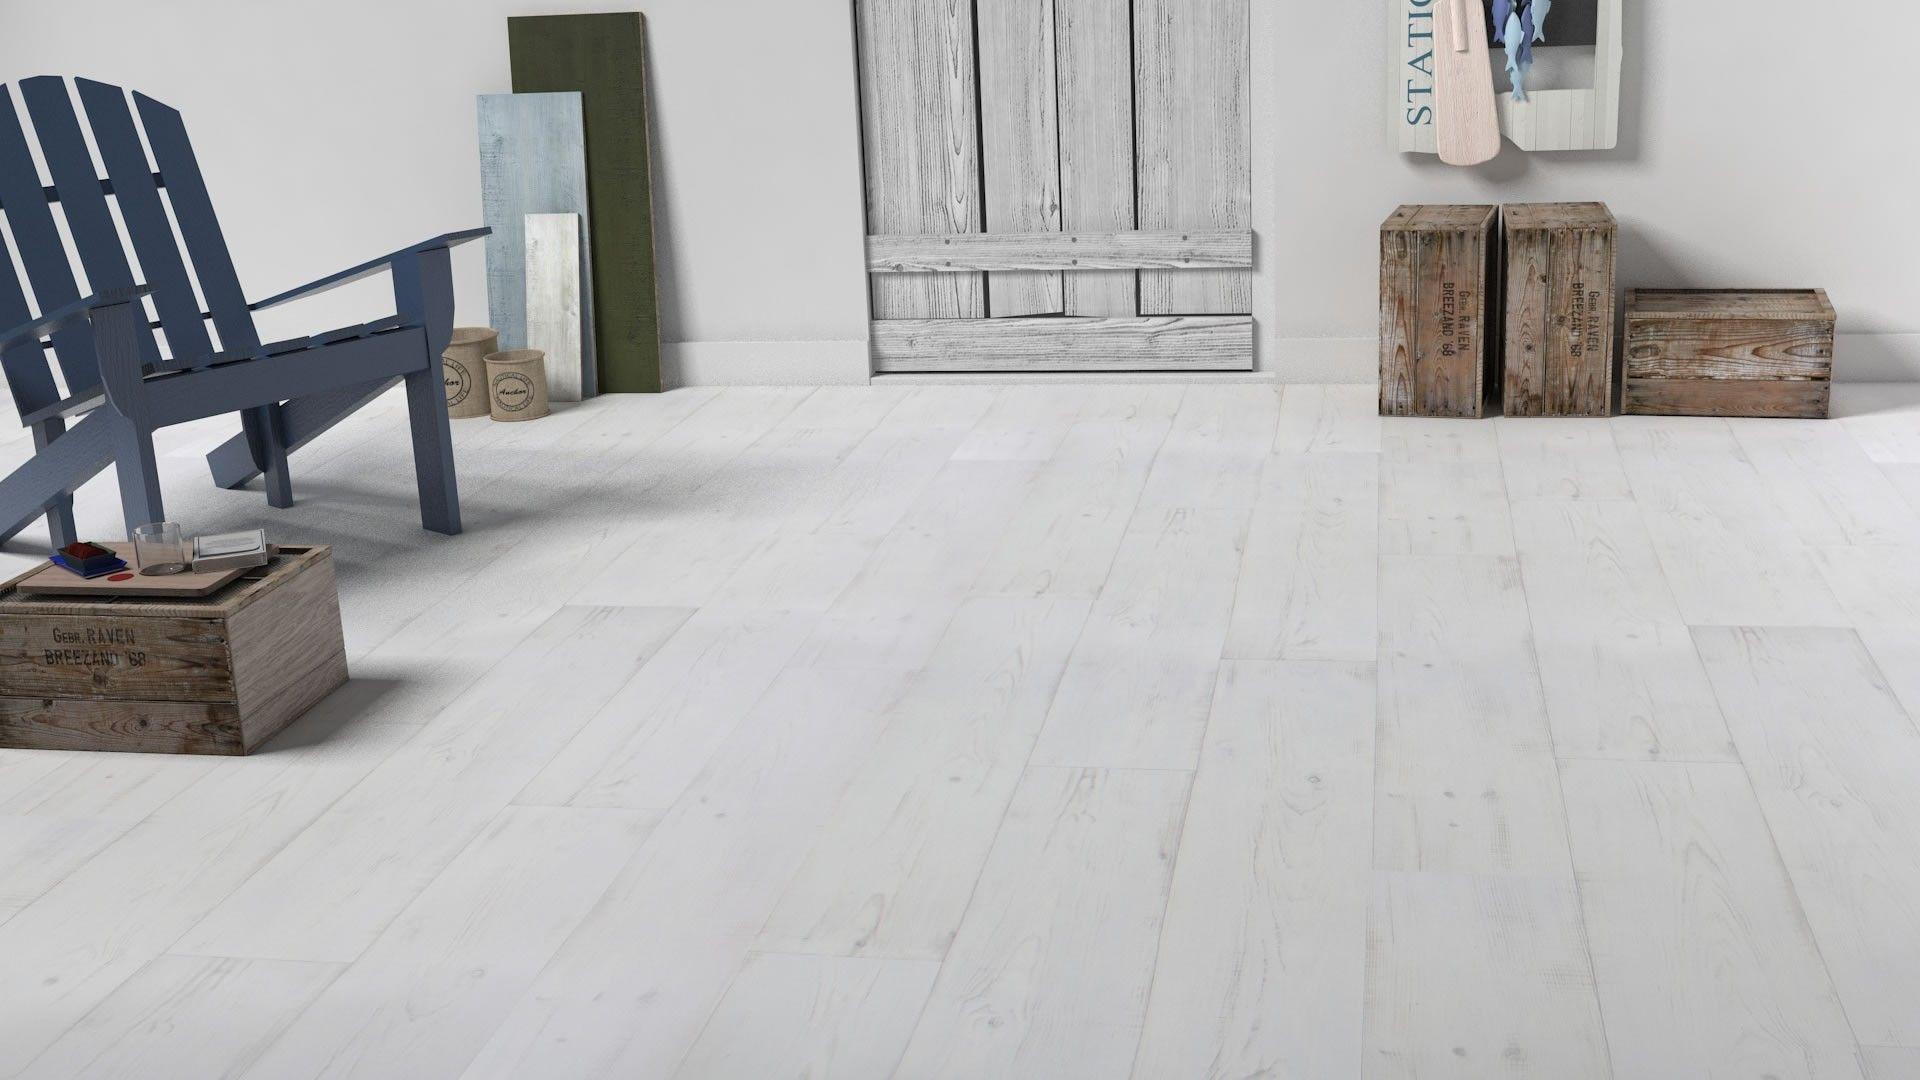 Lino Imitation Carrelage Blanc - Gamboahinestrosa encequiconcerne Sol Vinyle Presto Carrelage ...